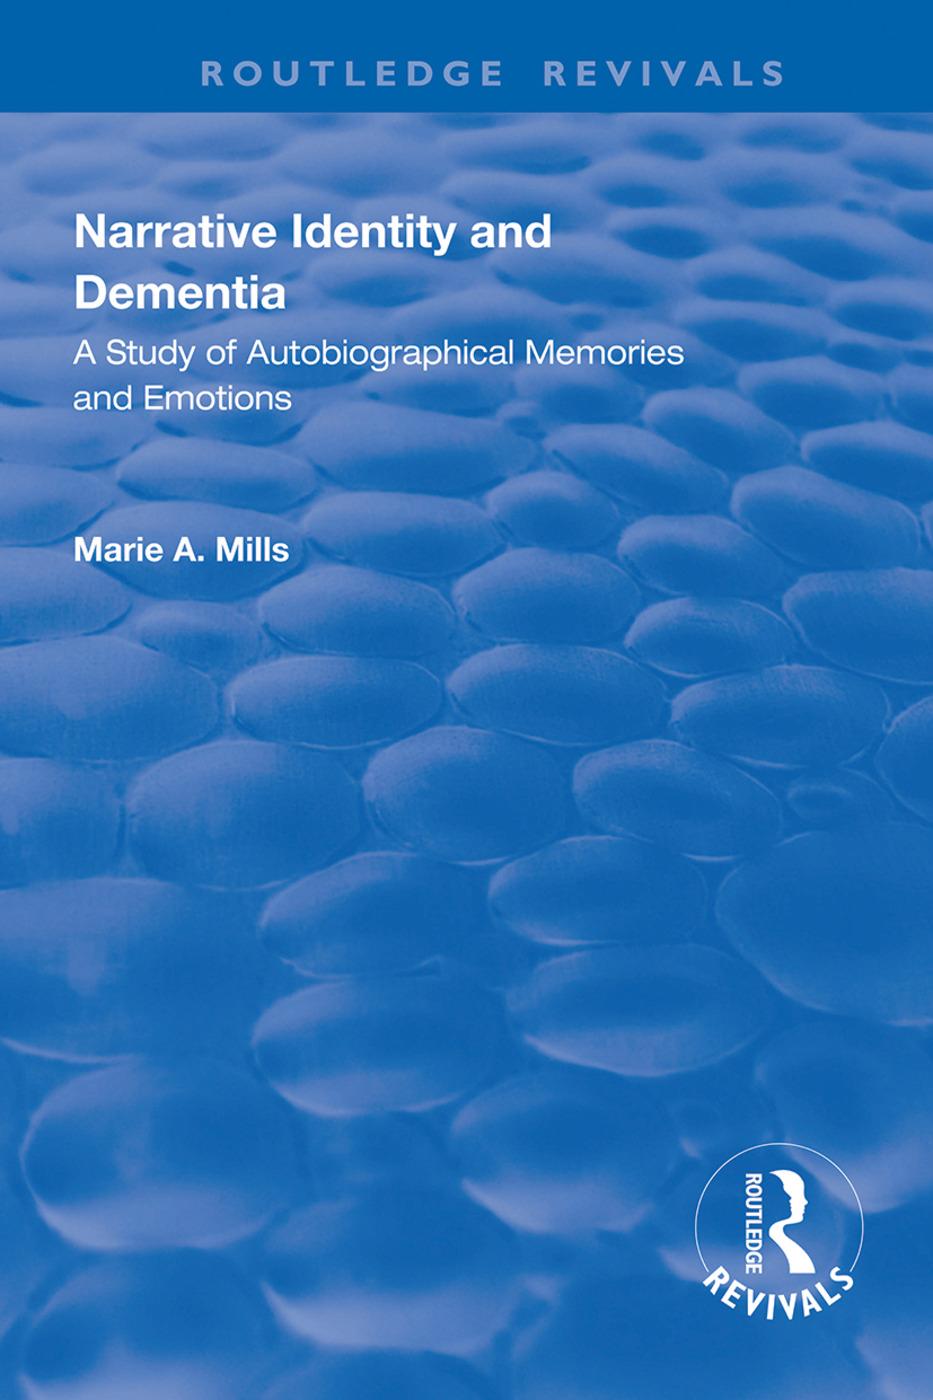 Narrative Identity and Dementia